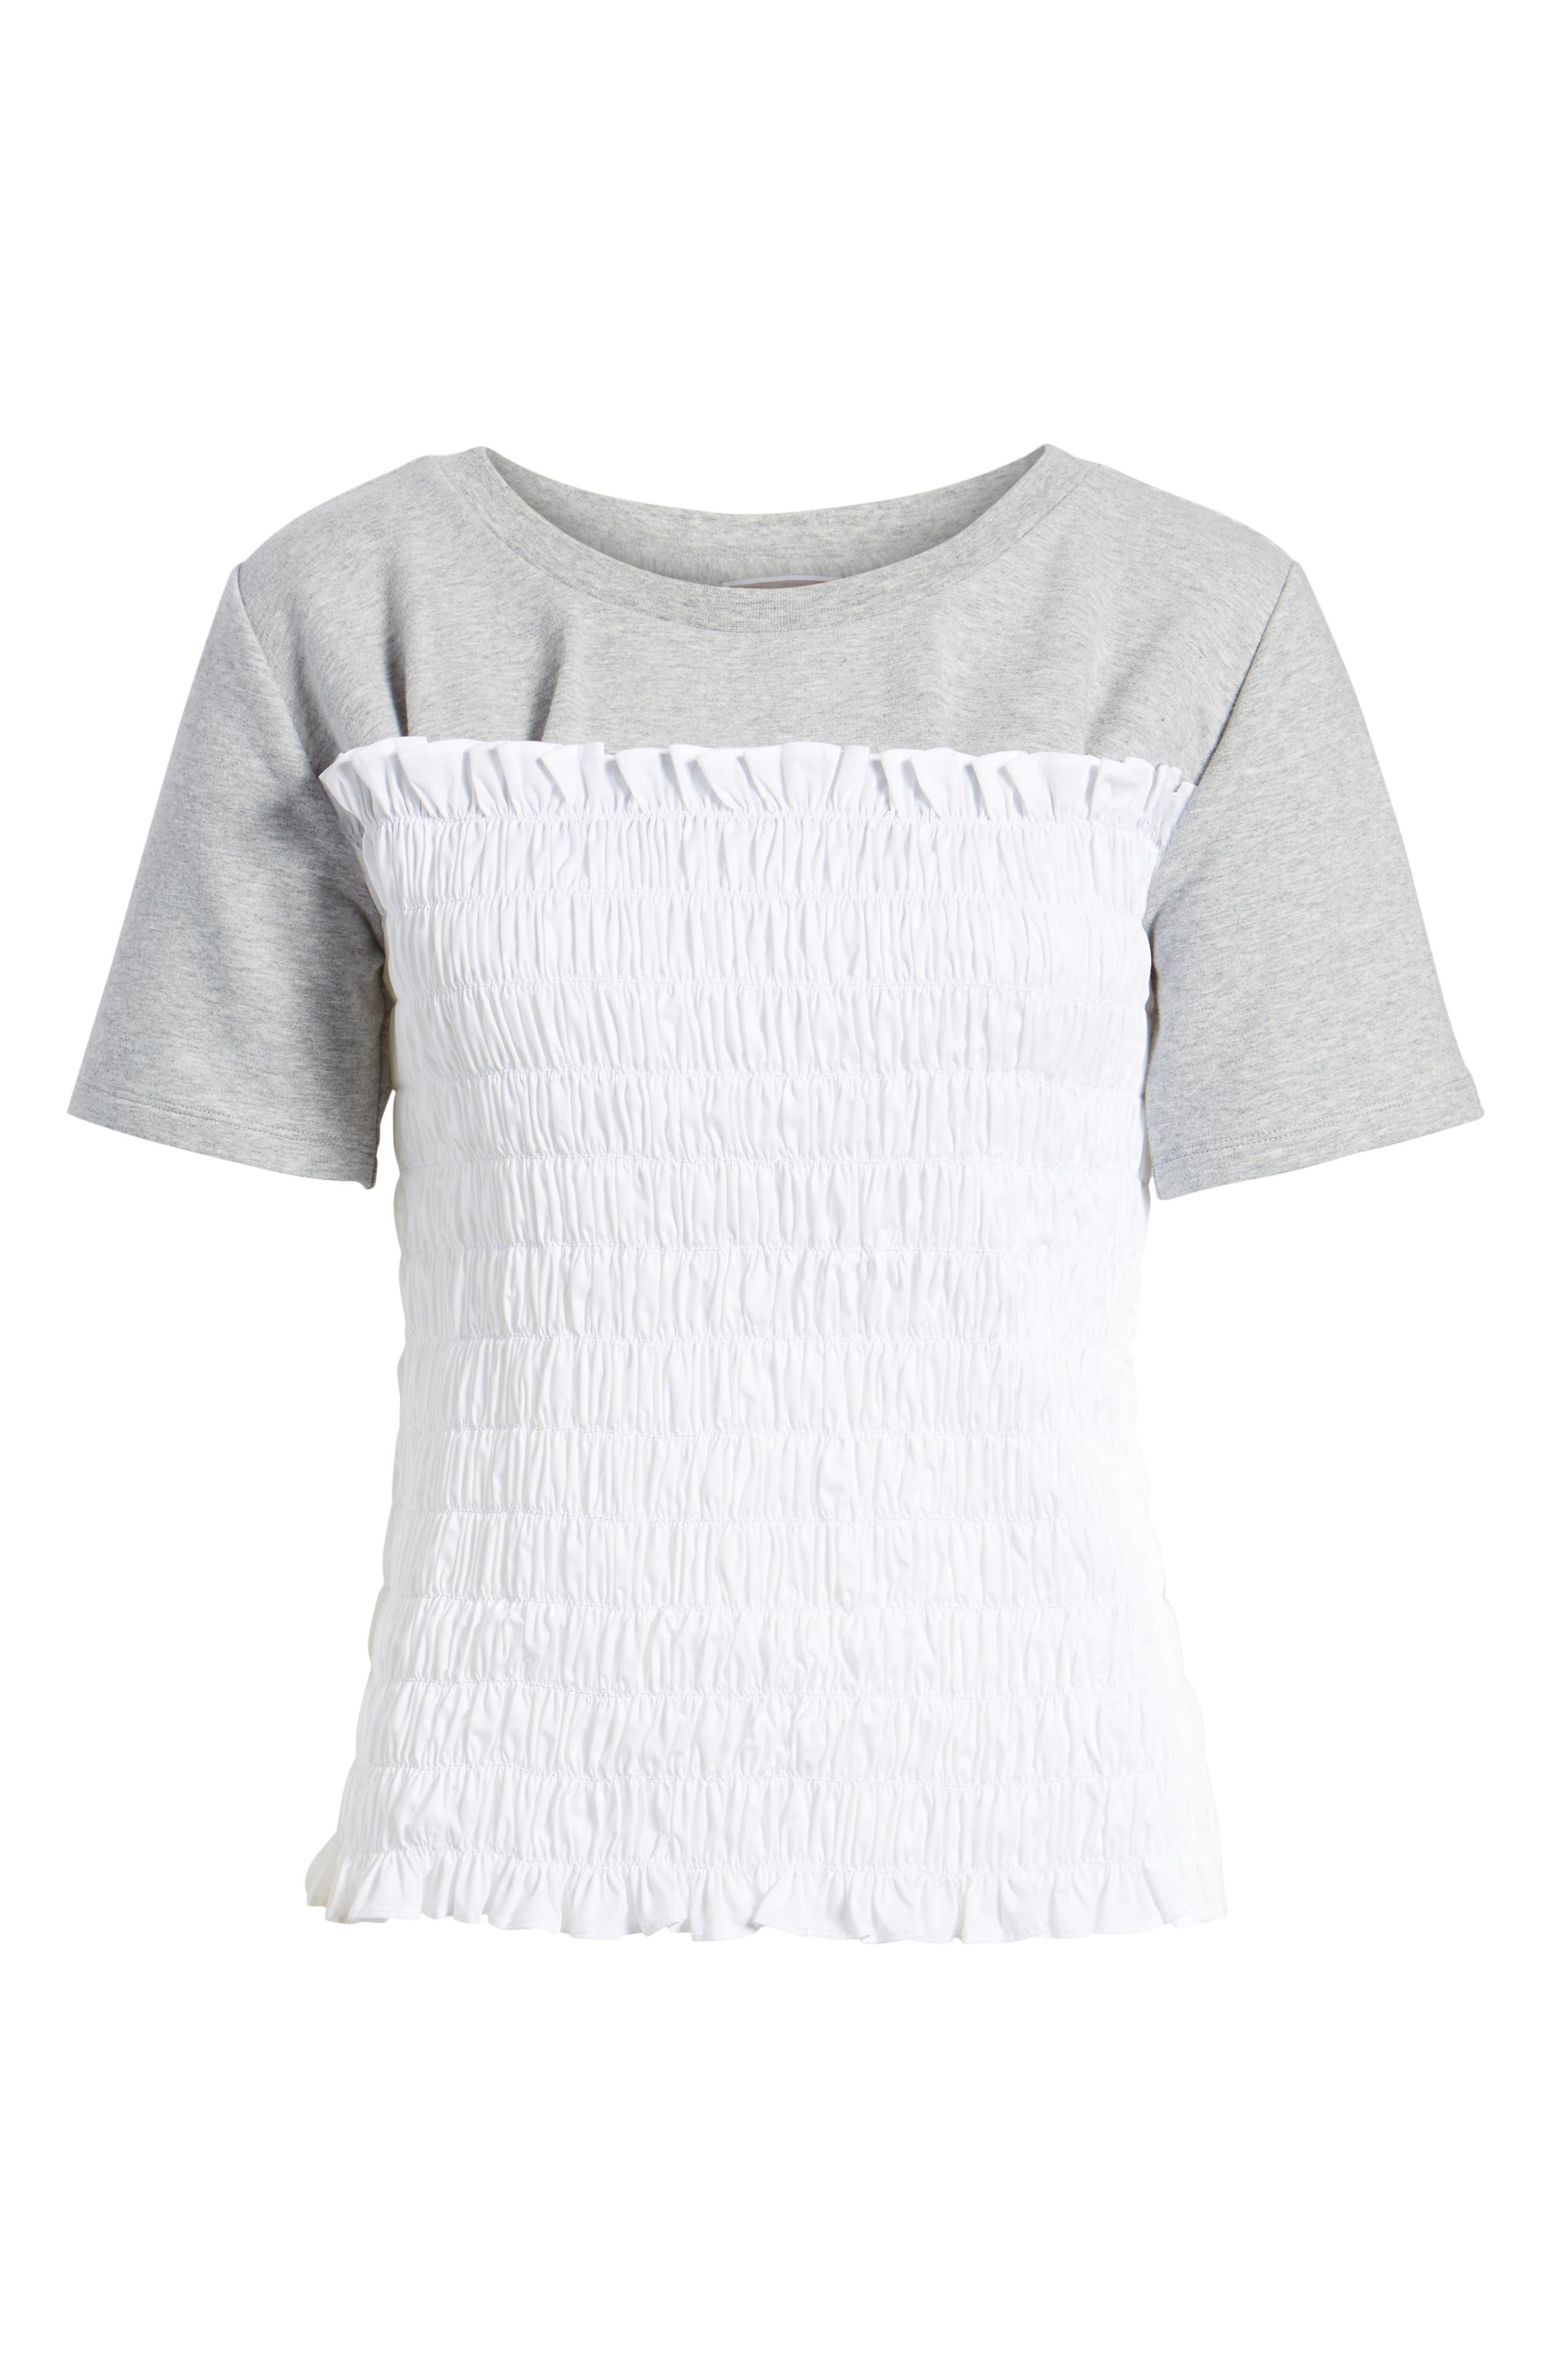 Smocked Sweatshirt,                             Alternate thumbnail 6, color,                             Grey Heather